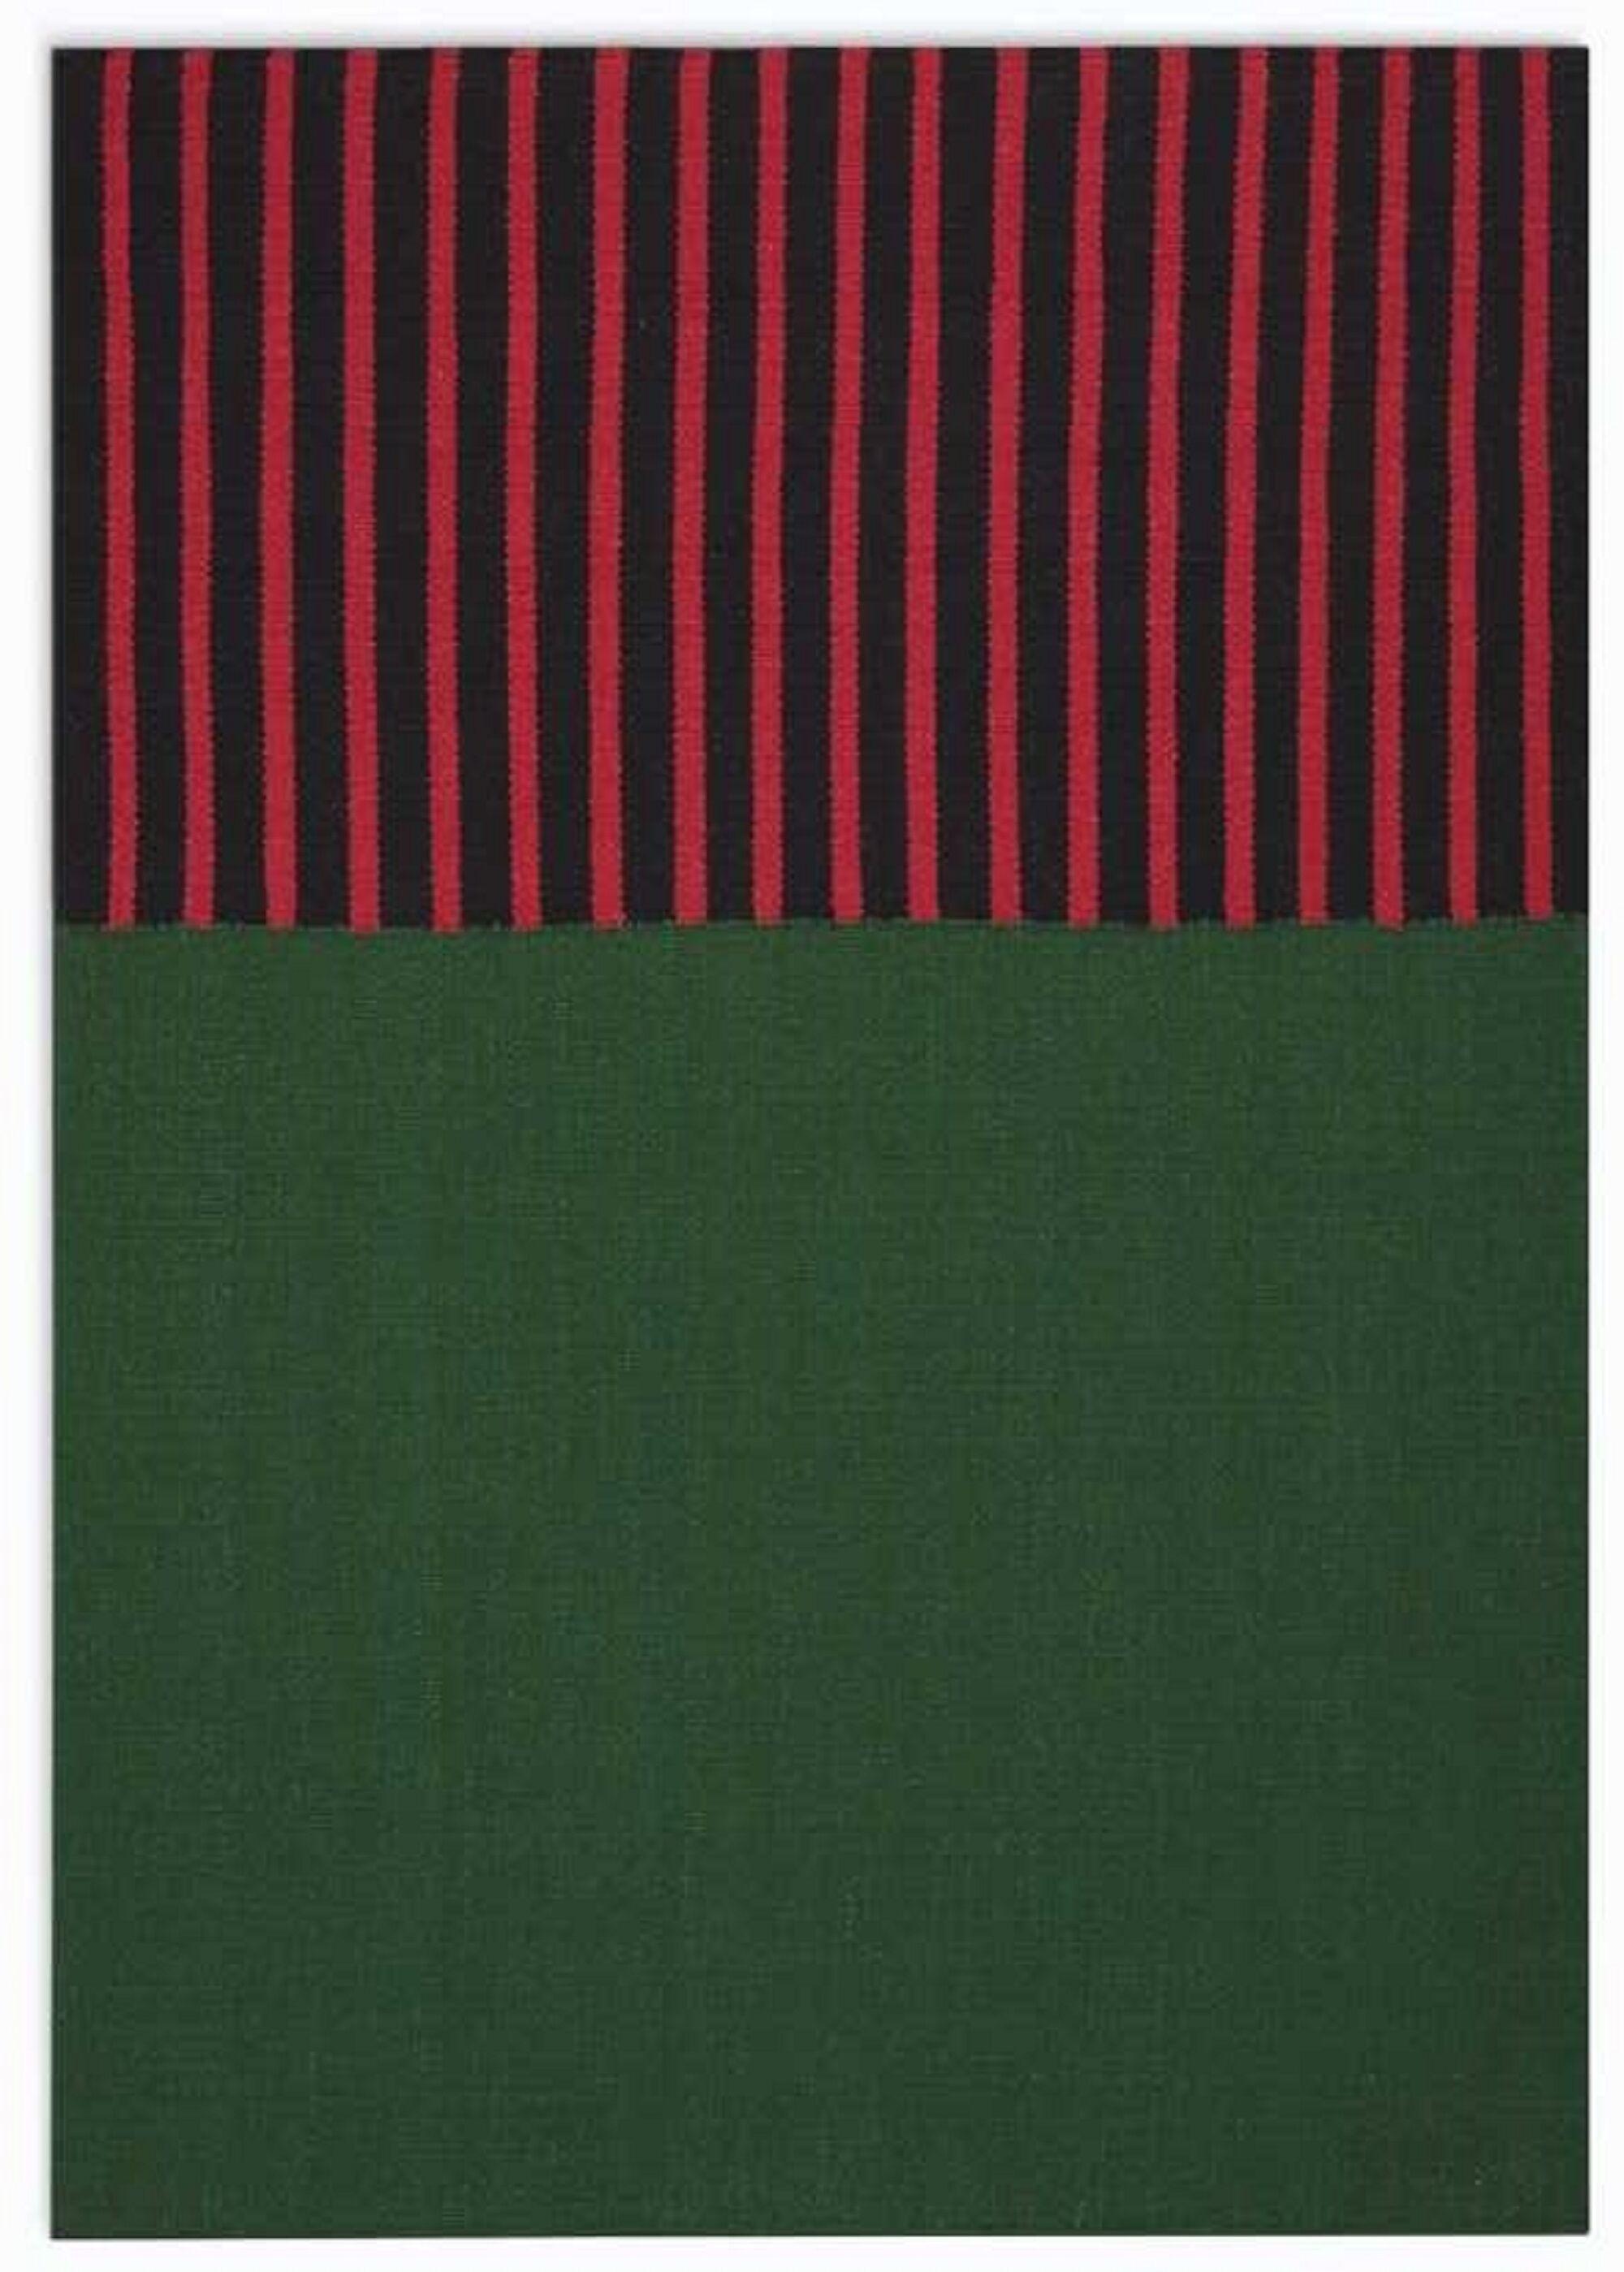 Nashville Modern Hand-Woven Green/Magenta/Black Area Rug Rug Size: Rectangle 5' x 7'